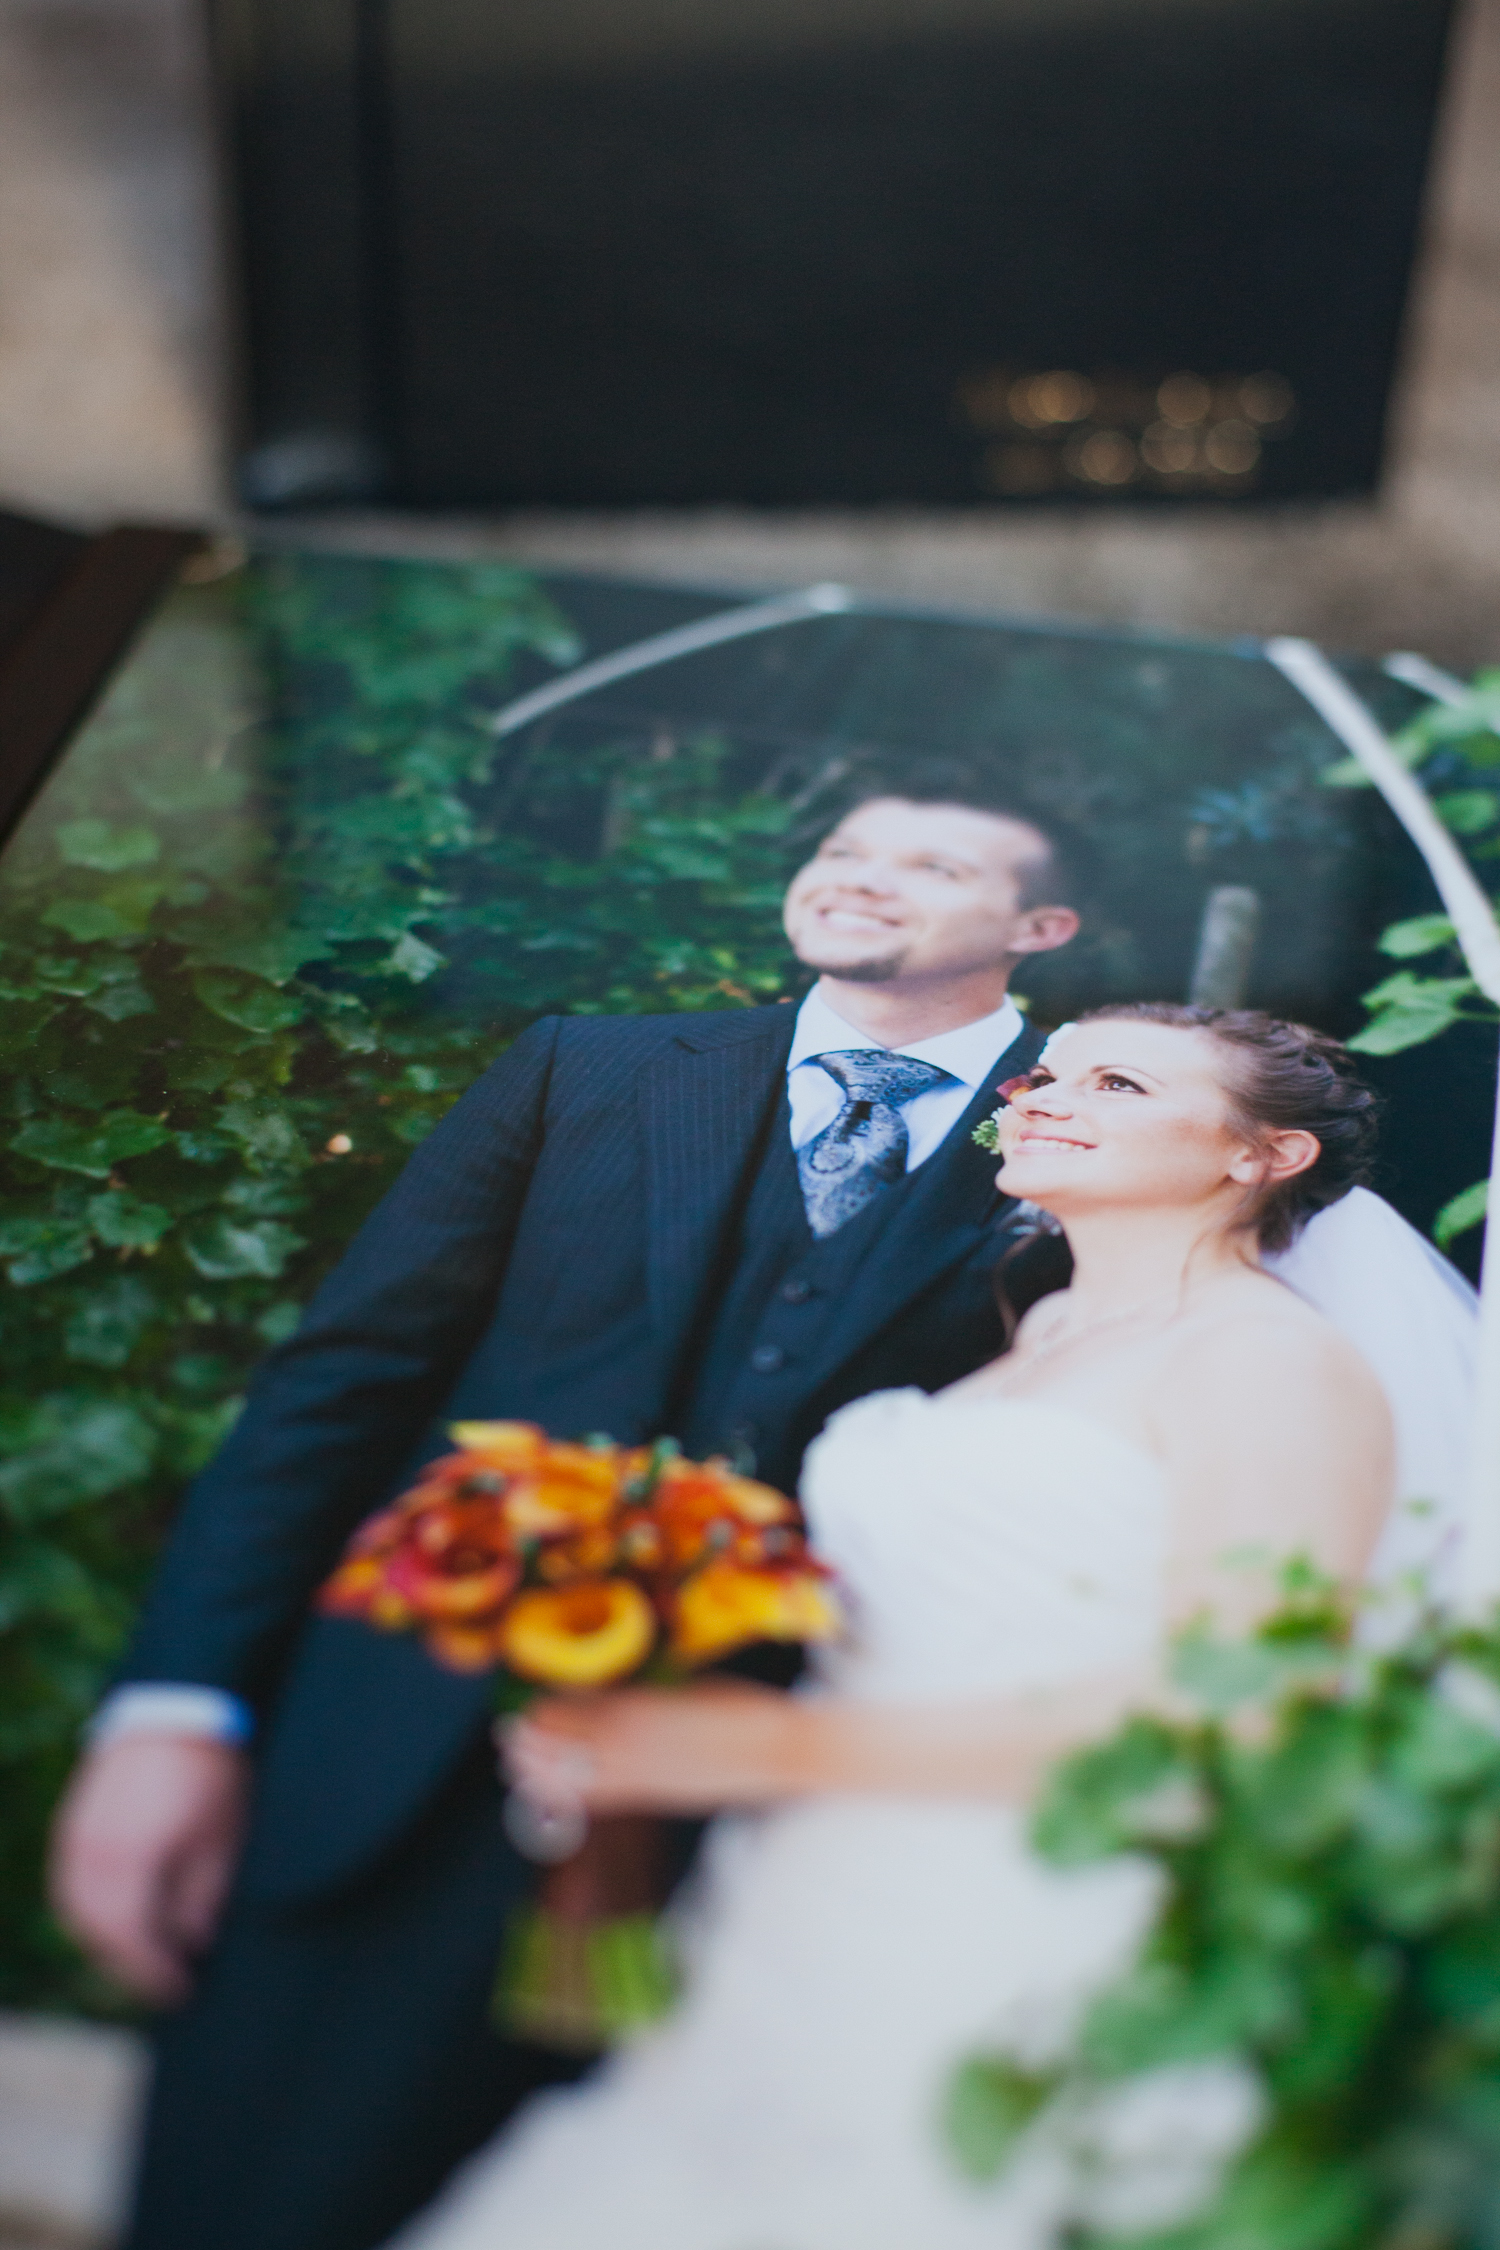 clear-glass-cover-option-wedding-flush-mount-album-front-lixxim-photography.jpg